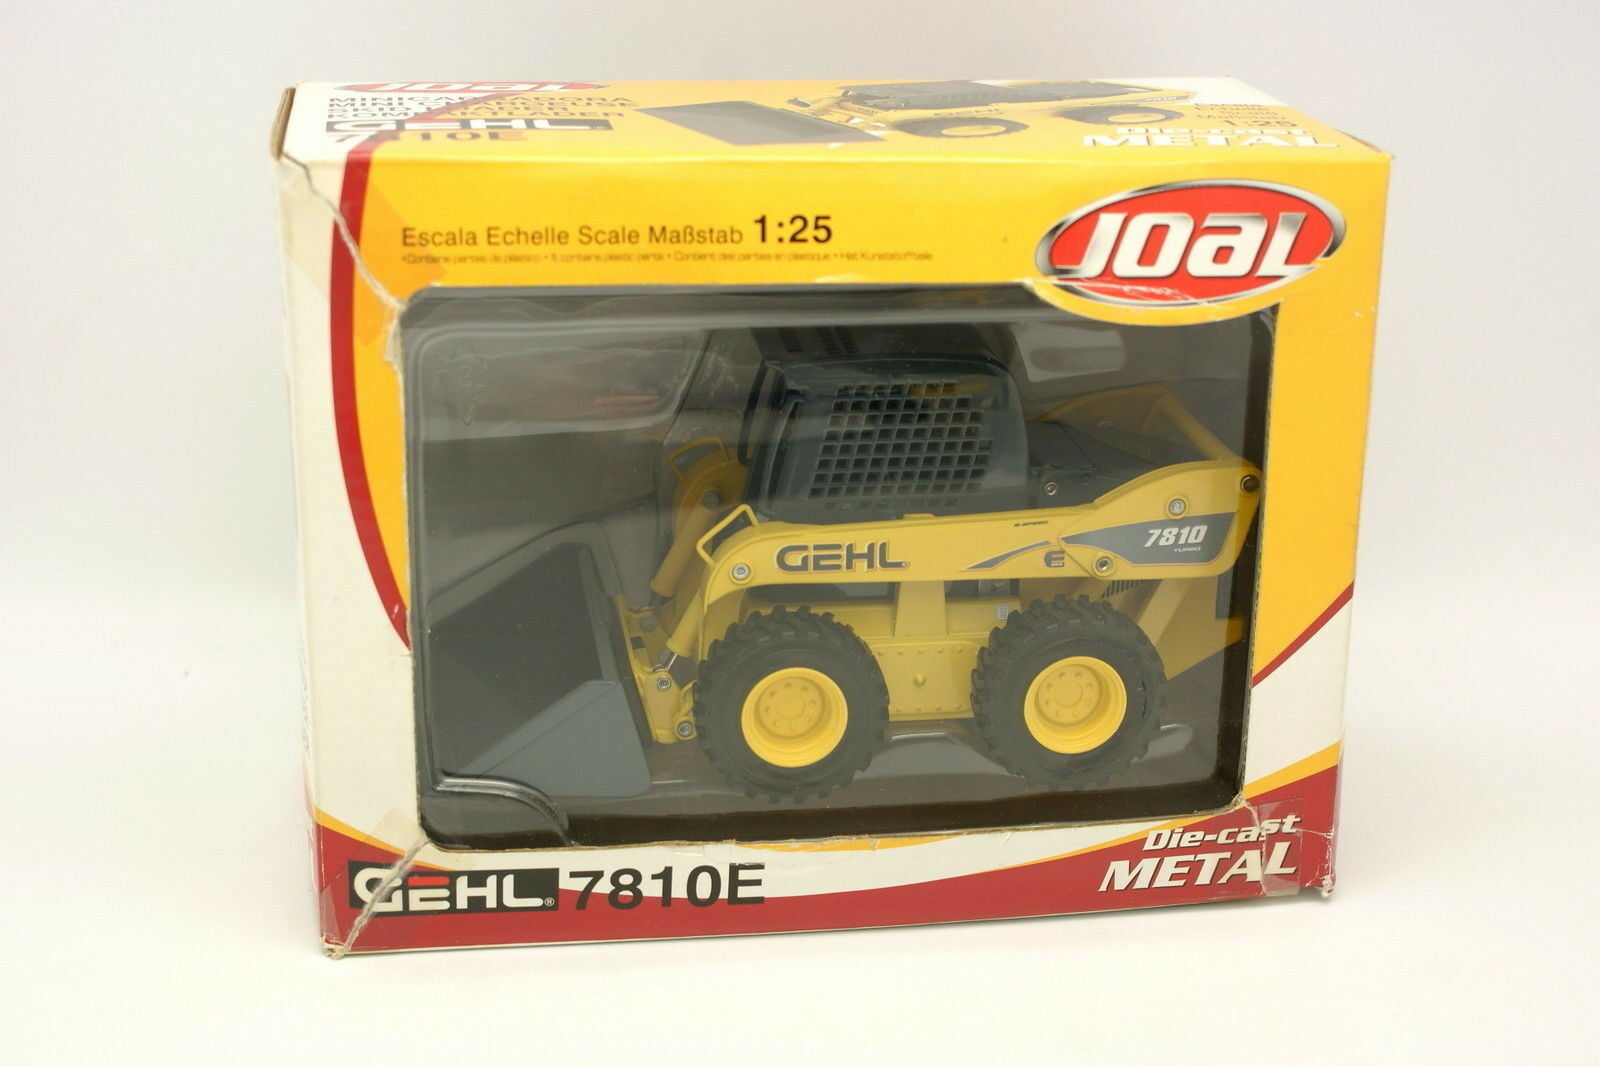 Joal BTP TP 1 1 1 25 - Gehl 7810E Mini Chargeuse ad1e4a